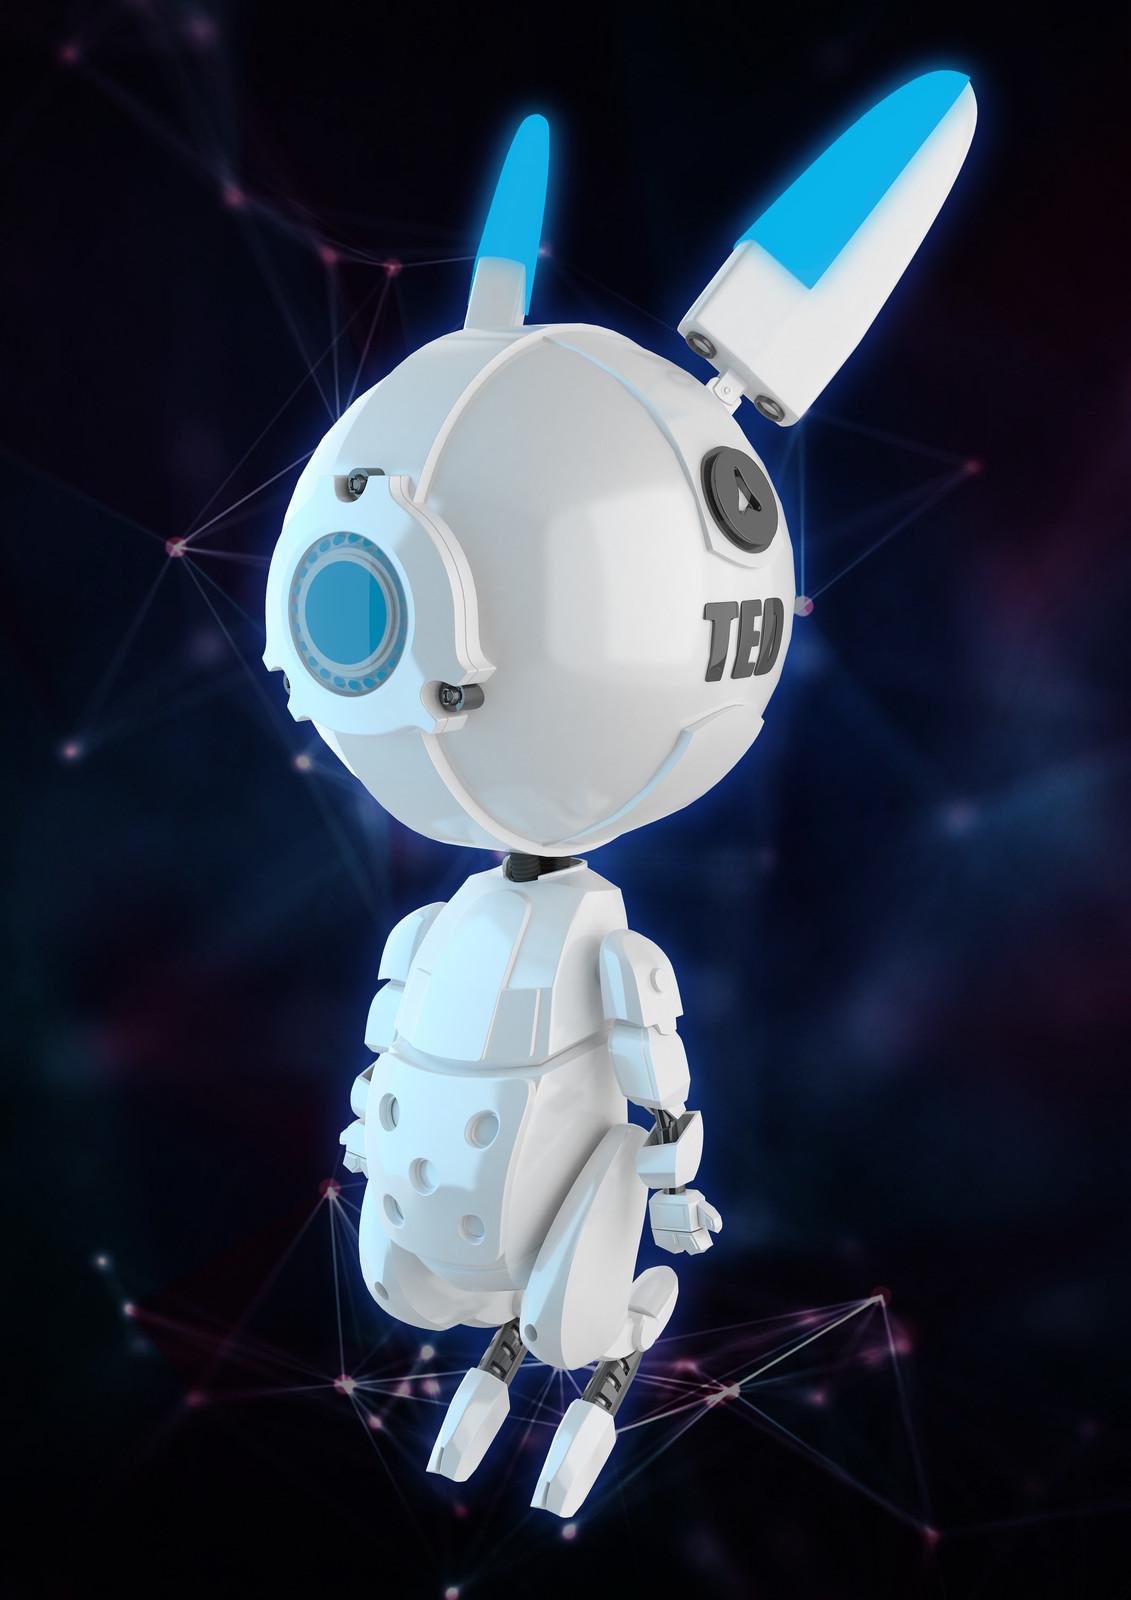 Robo Ted